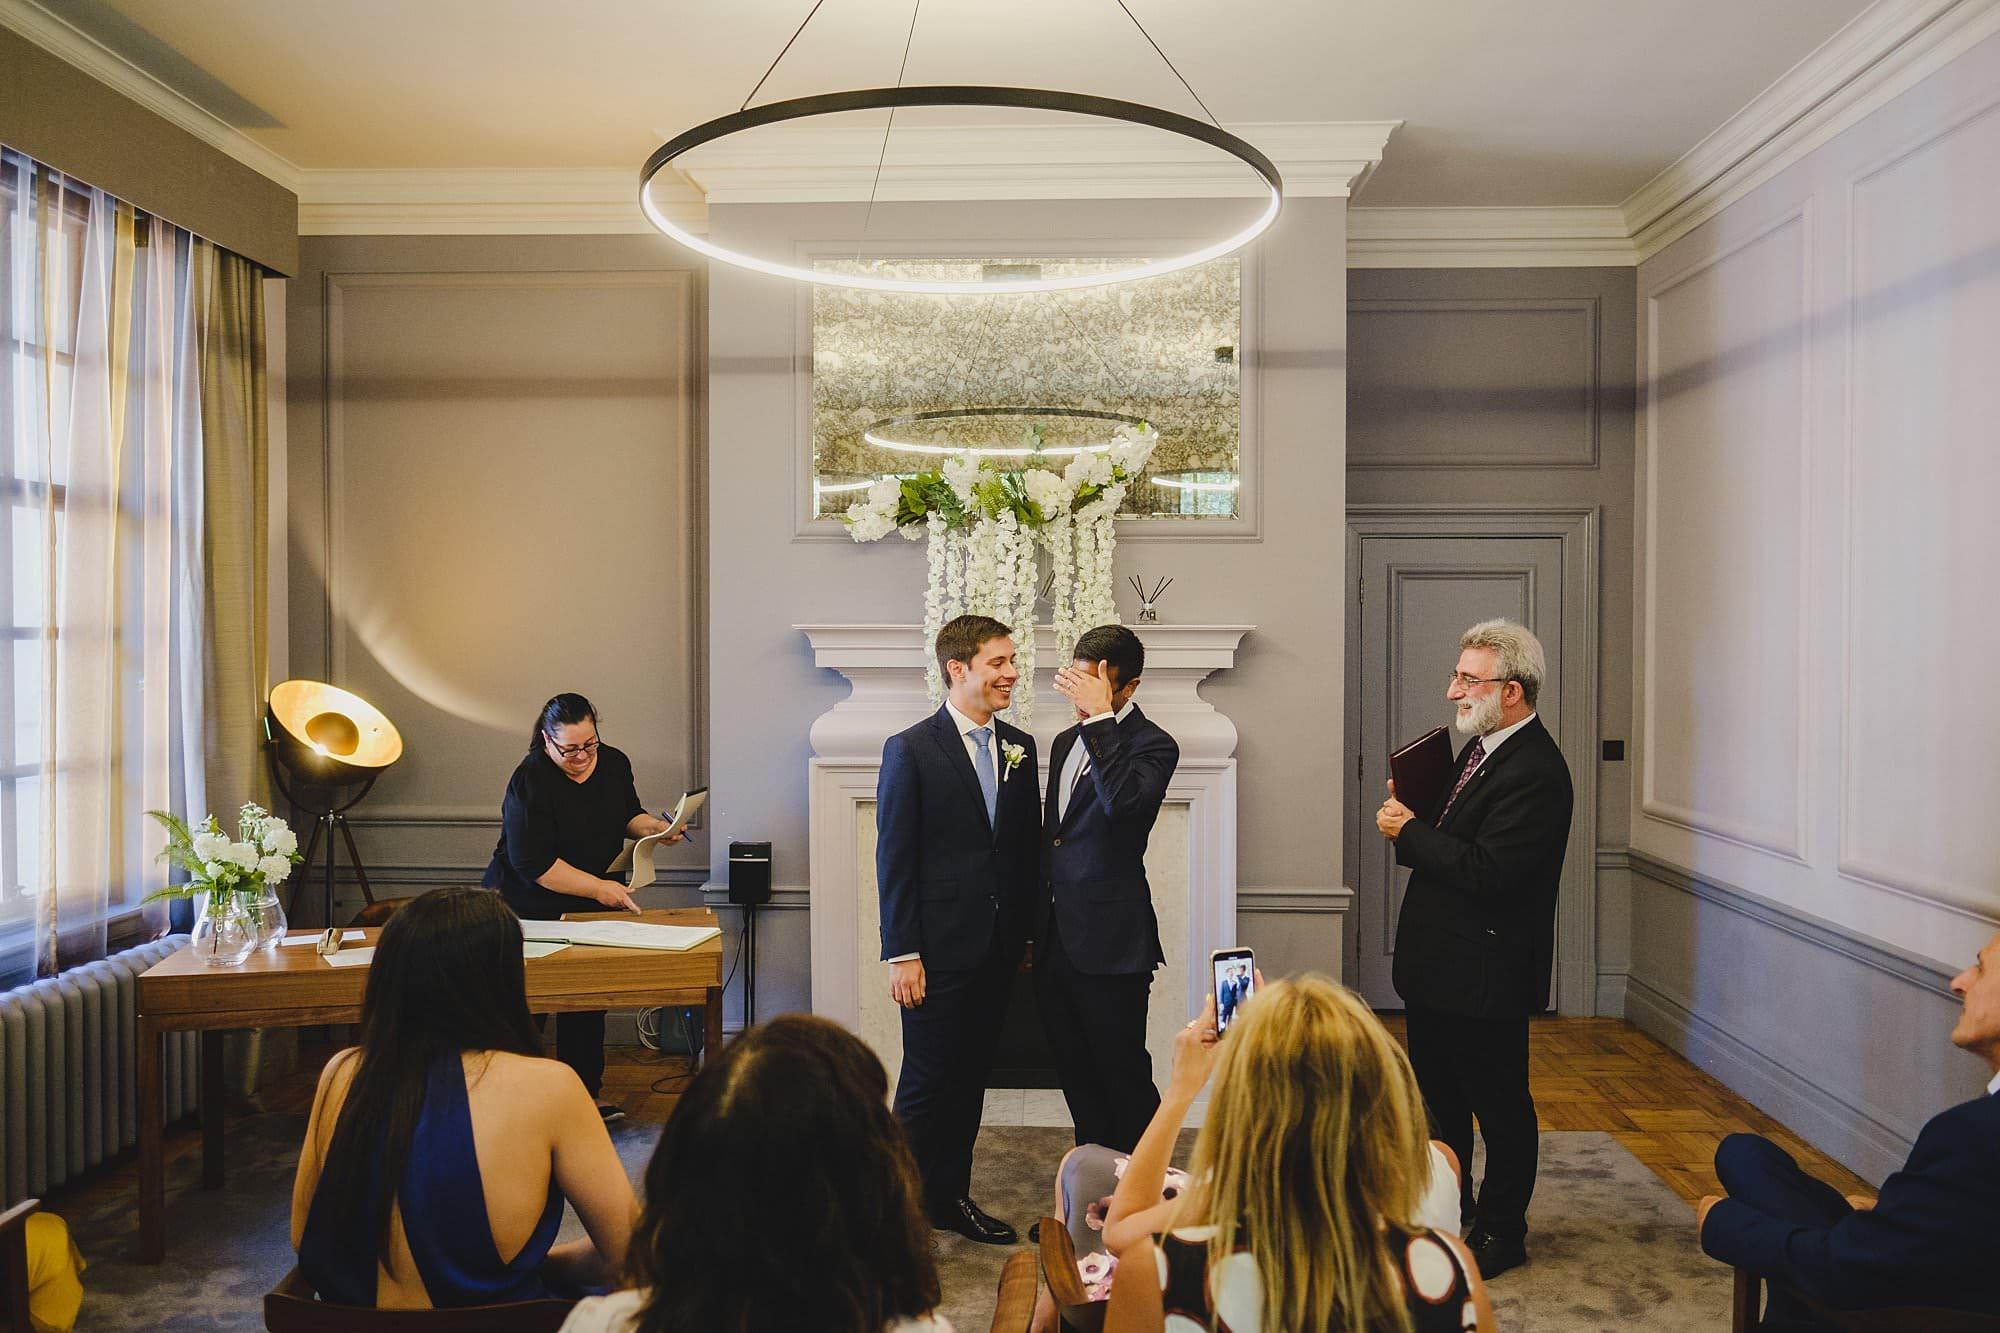 old marylebone town hall wedding photographer wedding jh 021 - Hugo + Josh   Marylebone